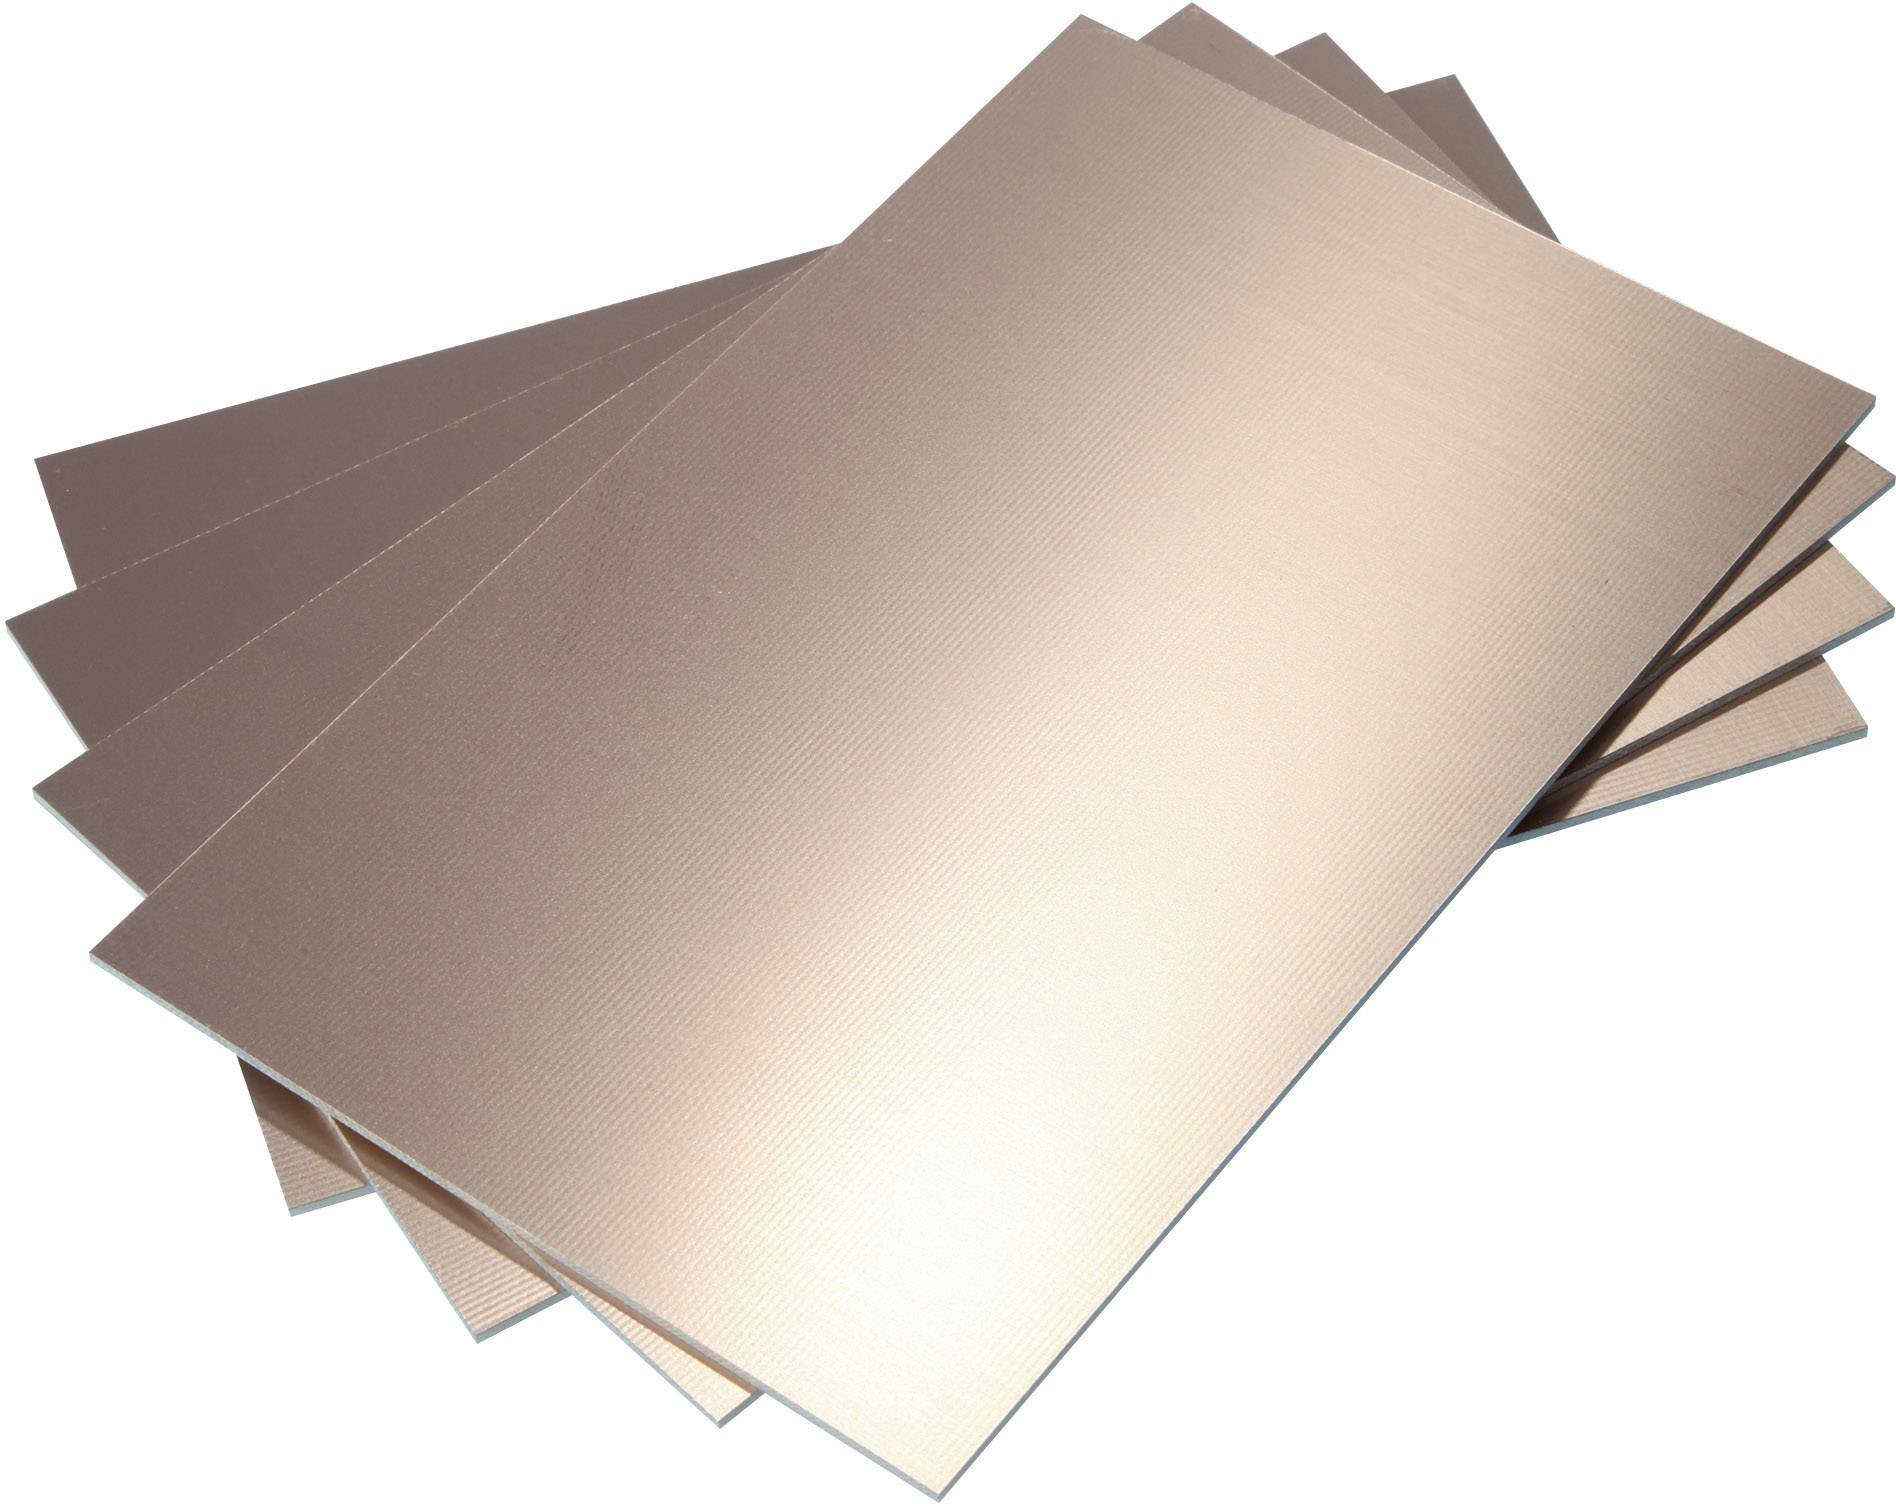 Cuprextit Bungard 030306E50, tvrzený papír, jednostranný, 100 x 60 x 1,5 mm